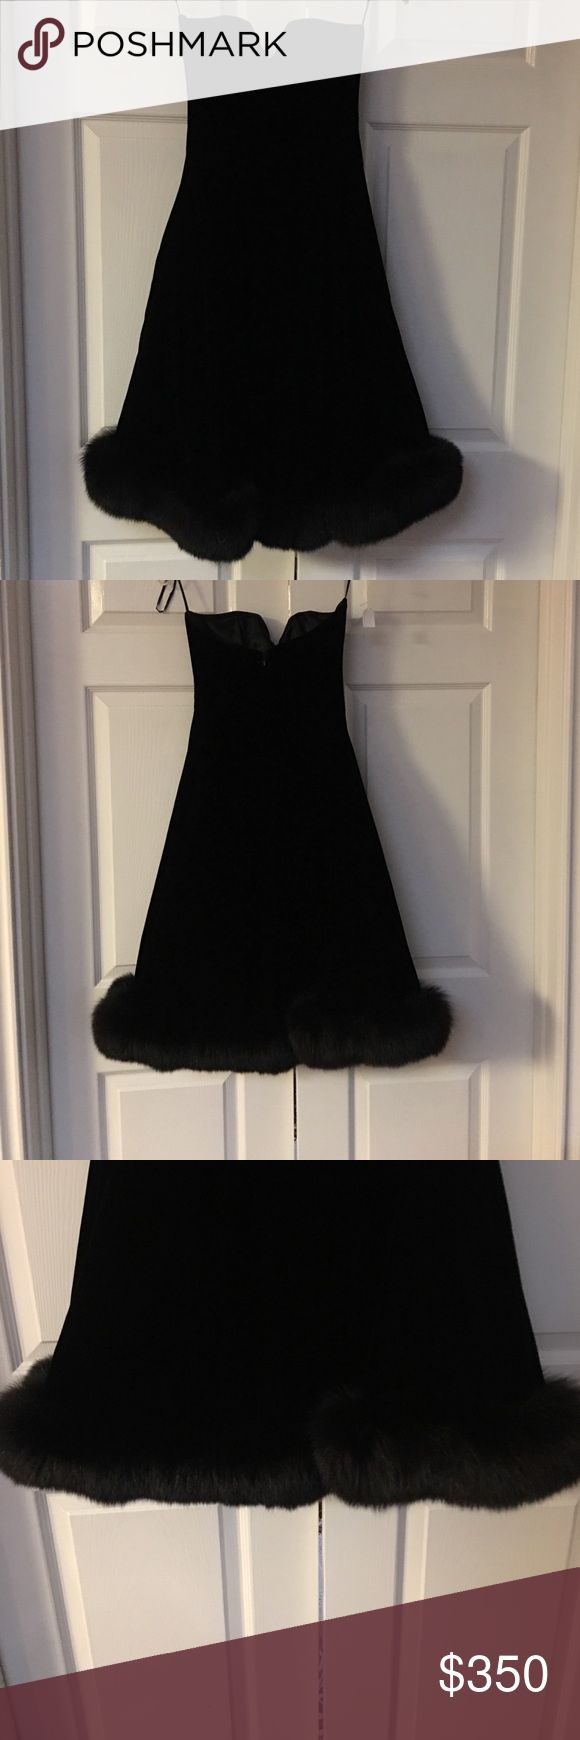 Escada classic black velvet strapless dress size 6 Classic Escada black velvet fox trimmed trimmed strapless dress size 6... Audrey Hepburn style glamour for sure!! escada Dresses Strapless